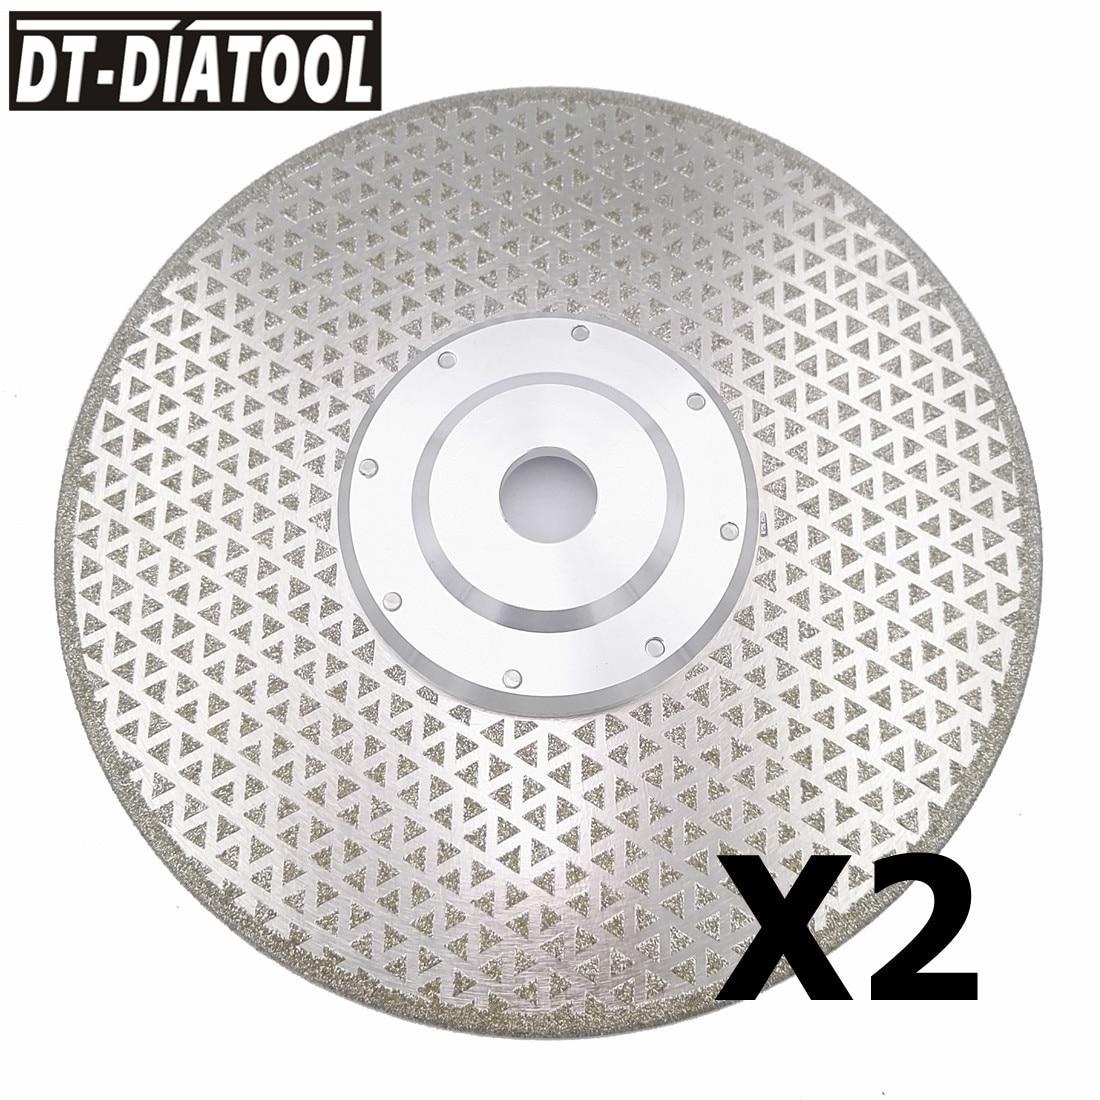 цена на DT-DIATOOL 2pks/pcs Dia 9/230mm Coated diamond cutting discs 22.23mm Flange Both Side electroplated saw blade grinding wheel